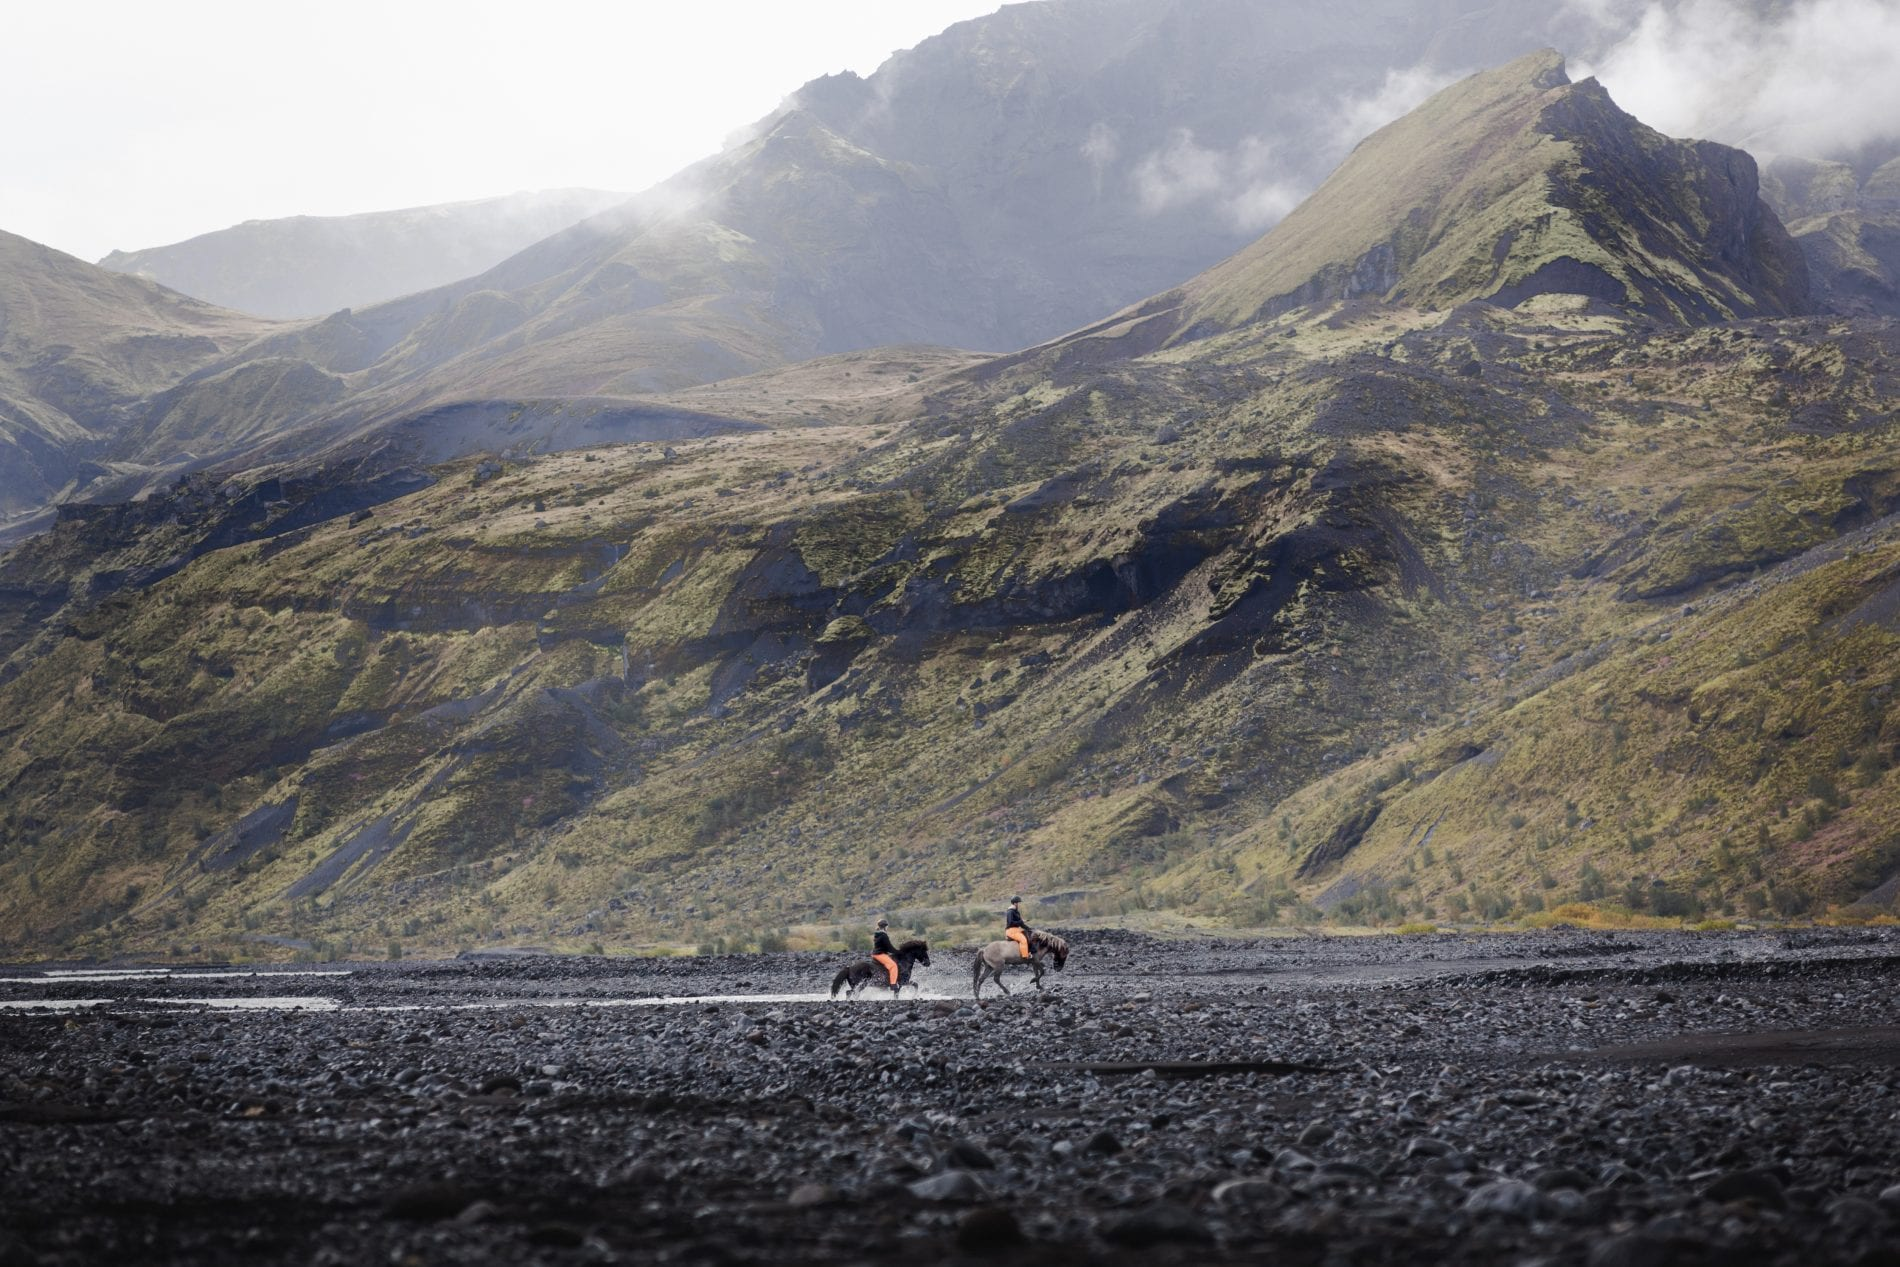 A couple riding in the fascinating landscape of Þórsmörk